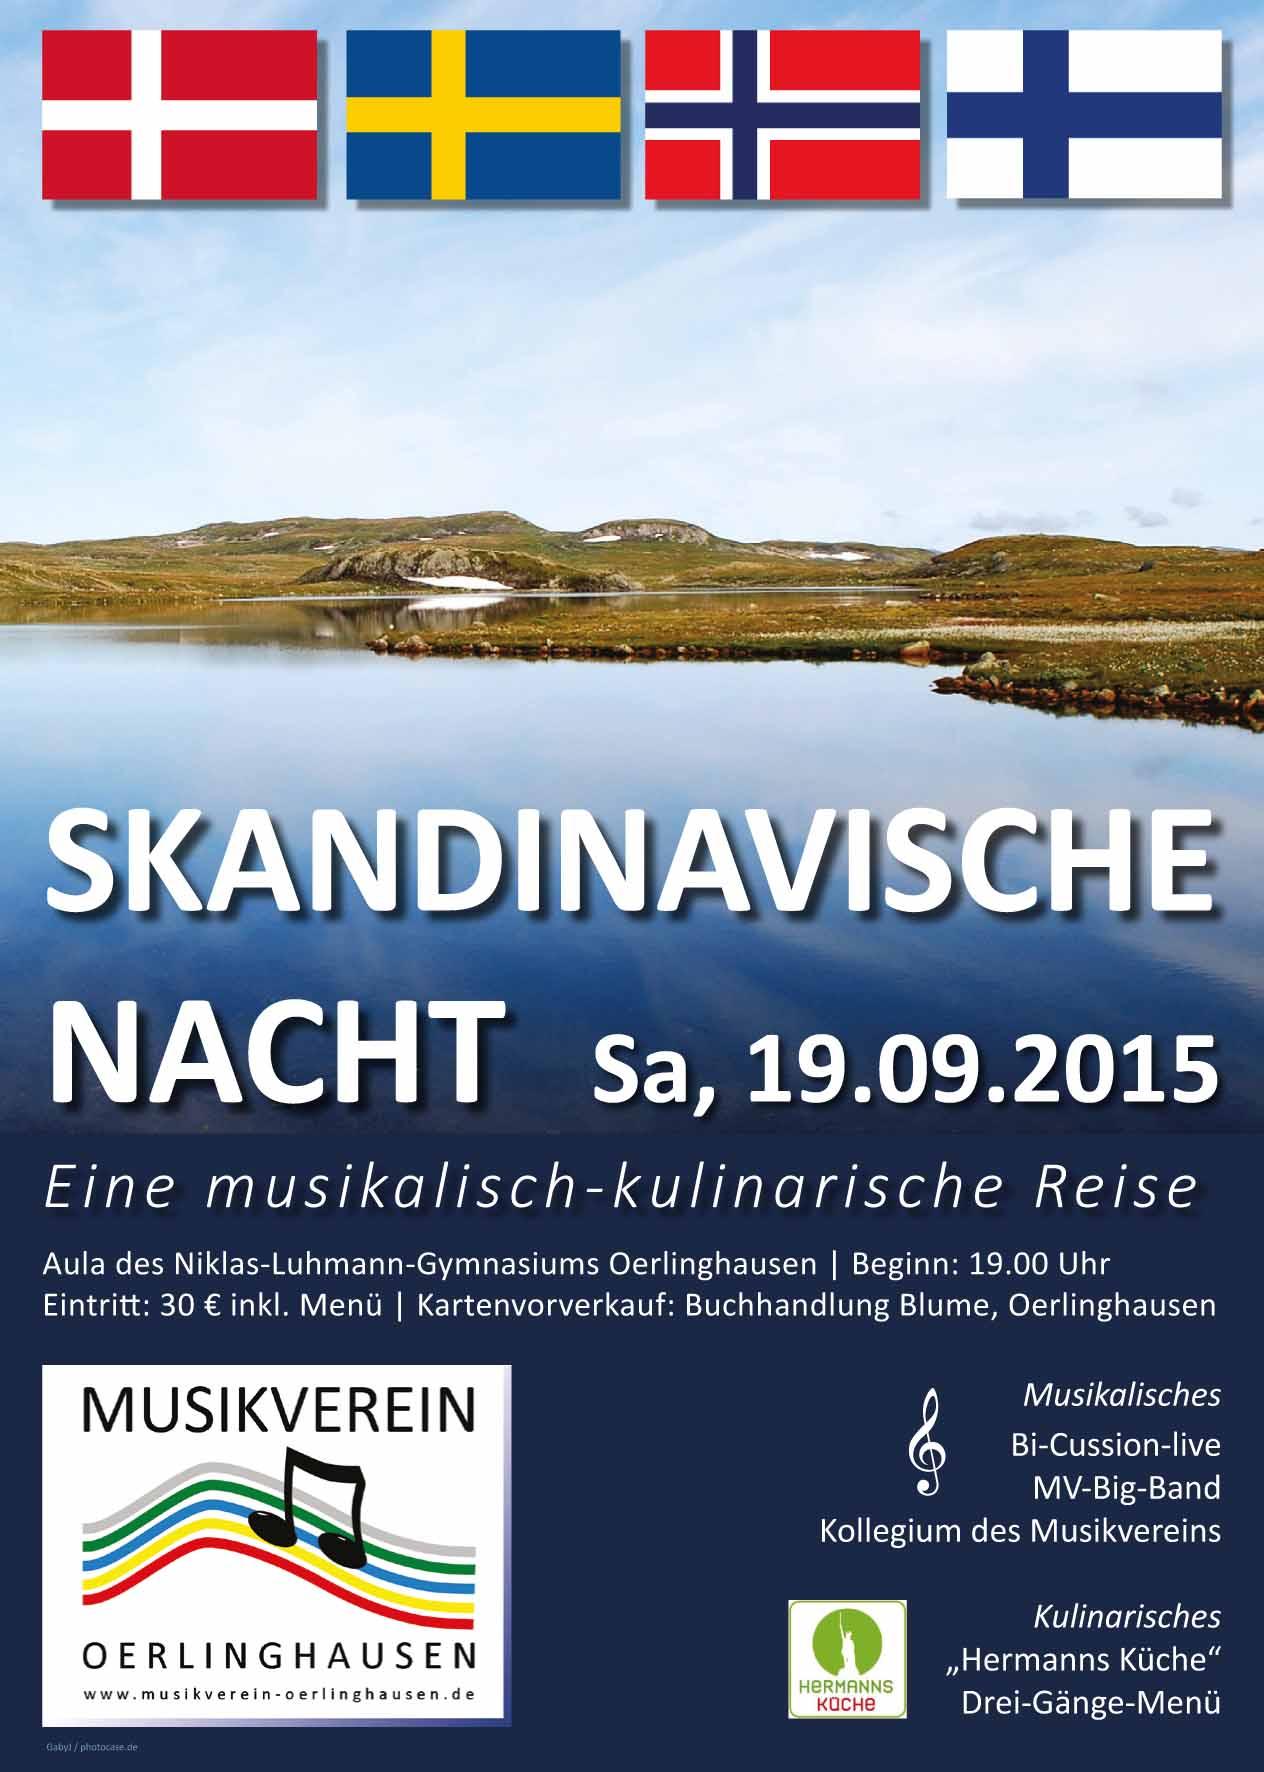 2015 Skandinavische_Nacht